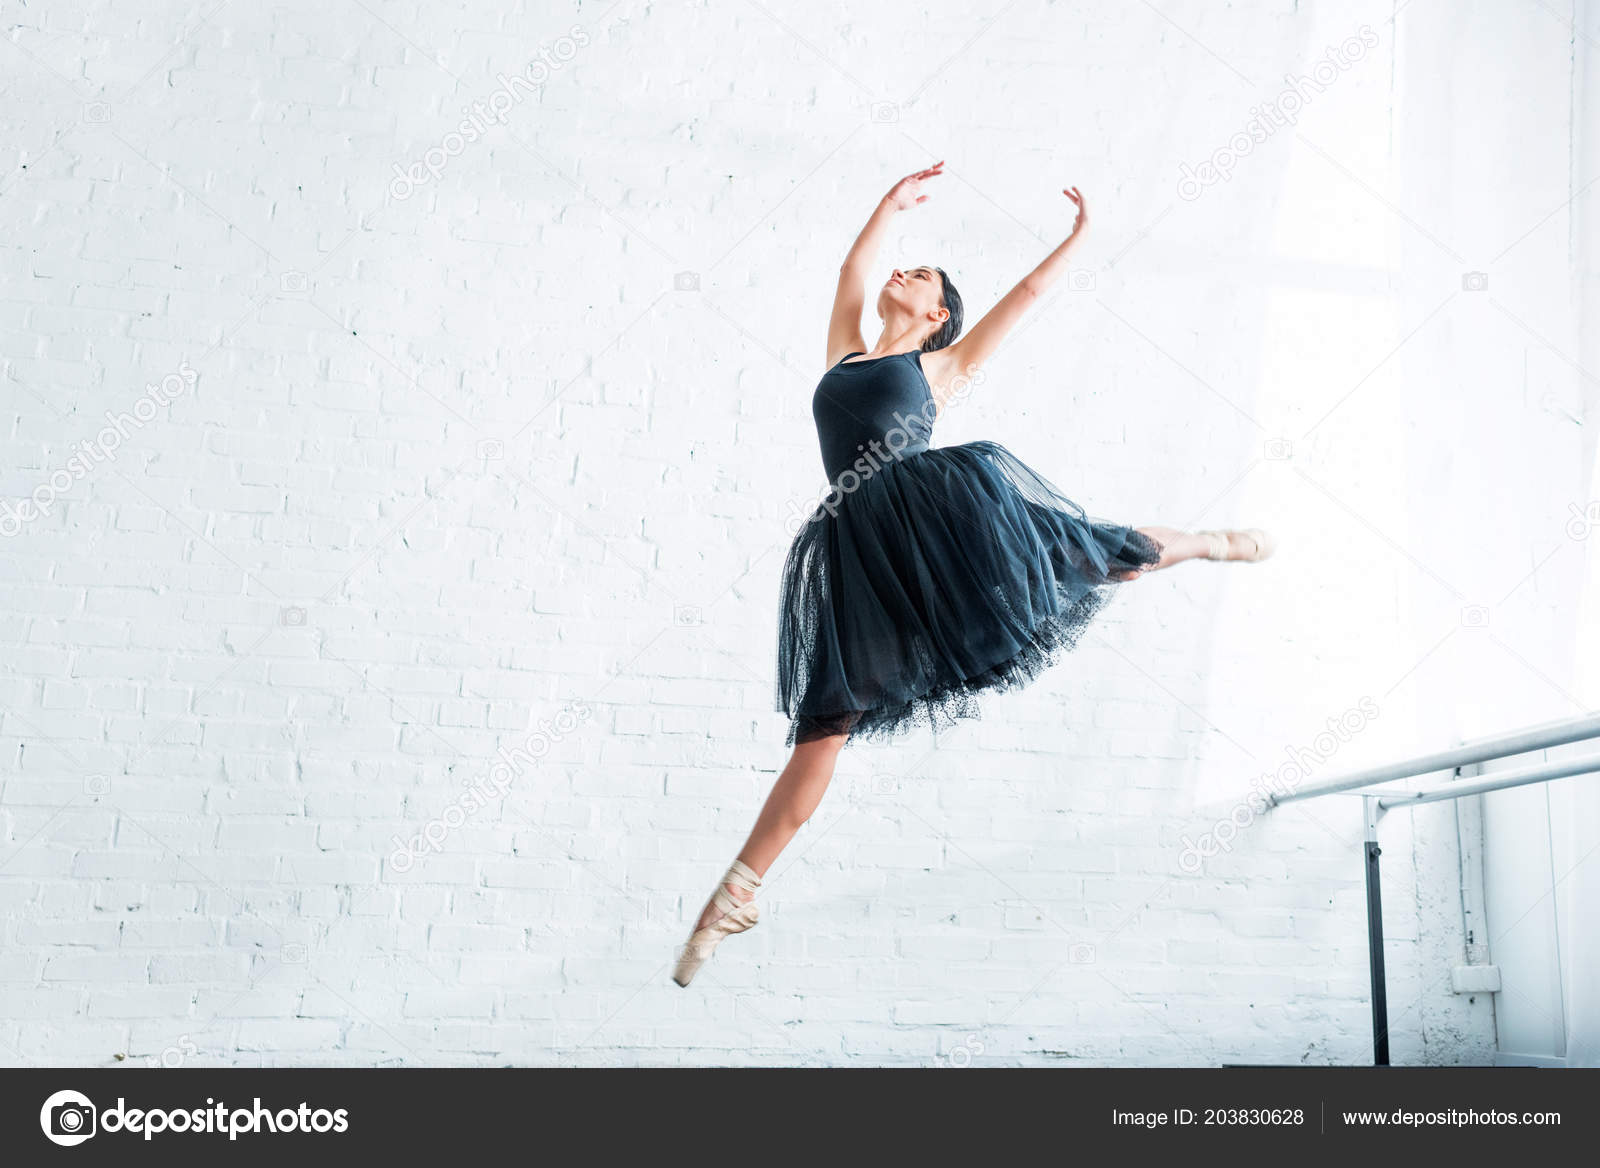 76acbd9febfd Låg Vinkel Syn Vackra Unga Ballerina Dans Balett Studio — Stockfoto